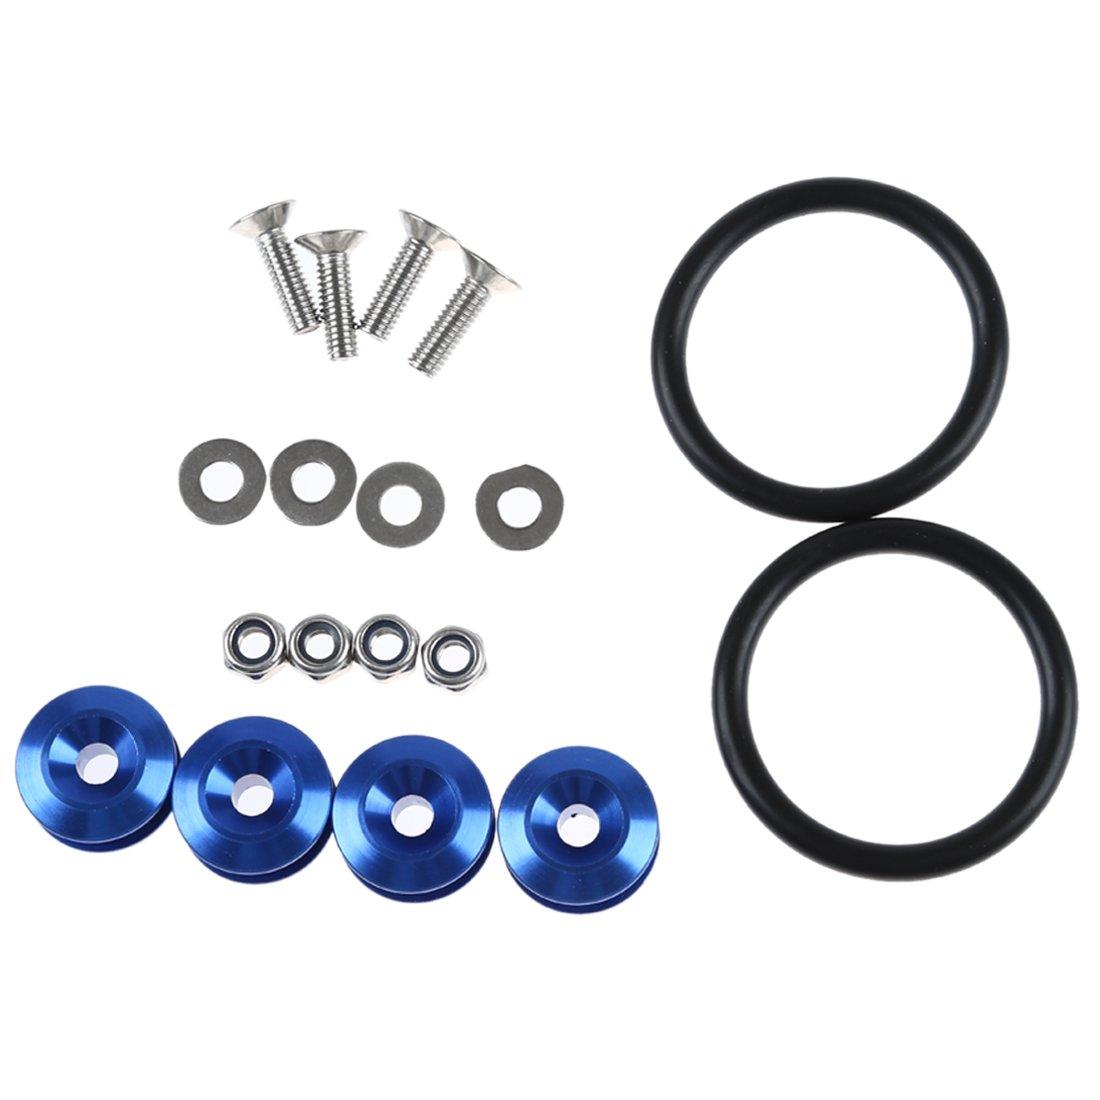 Bolt Loop - SODIAL(R) Blue Quick Release JDM Bumper Fender Trunk Fastener Screw Bolt Loop Ring Kit 59208A1